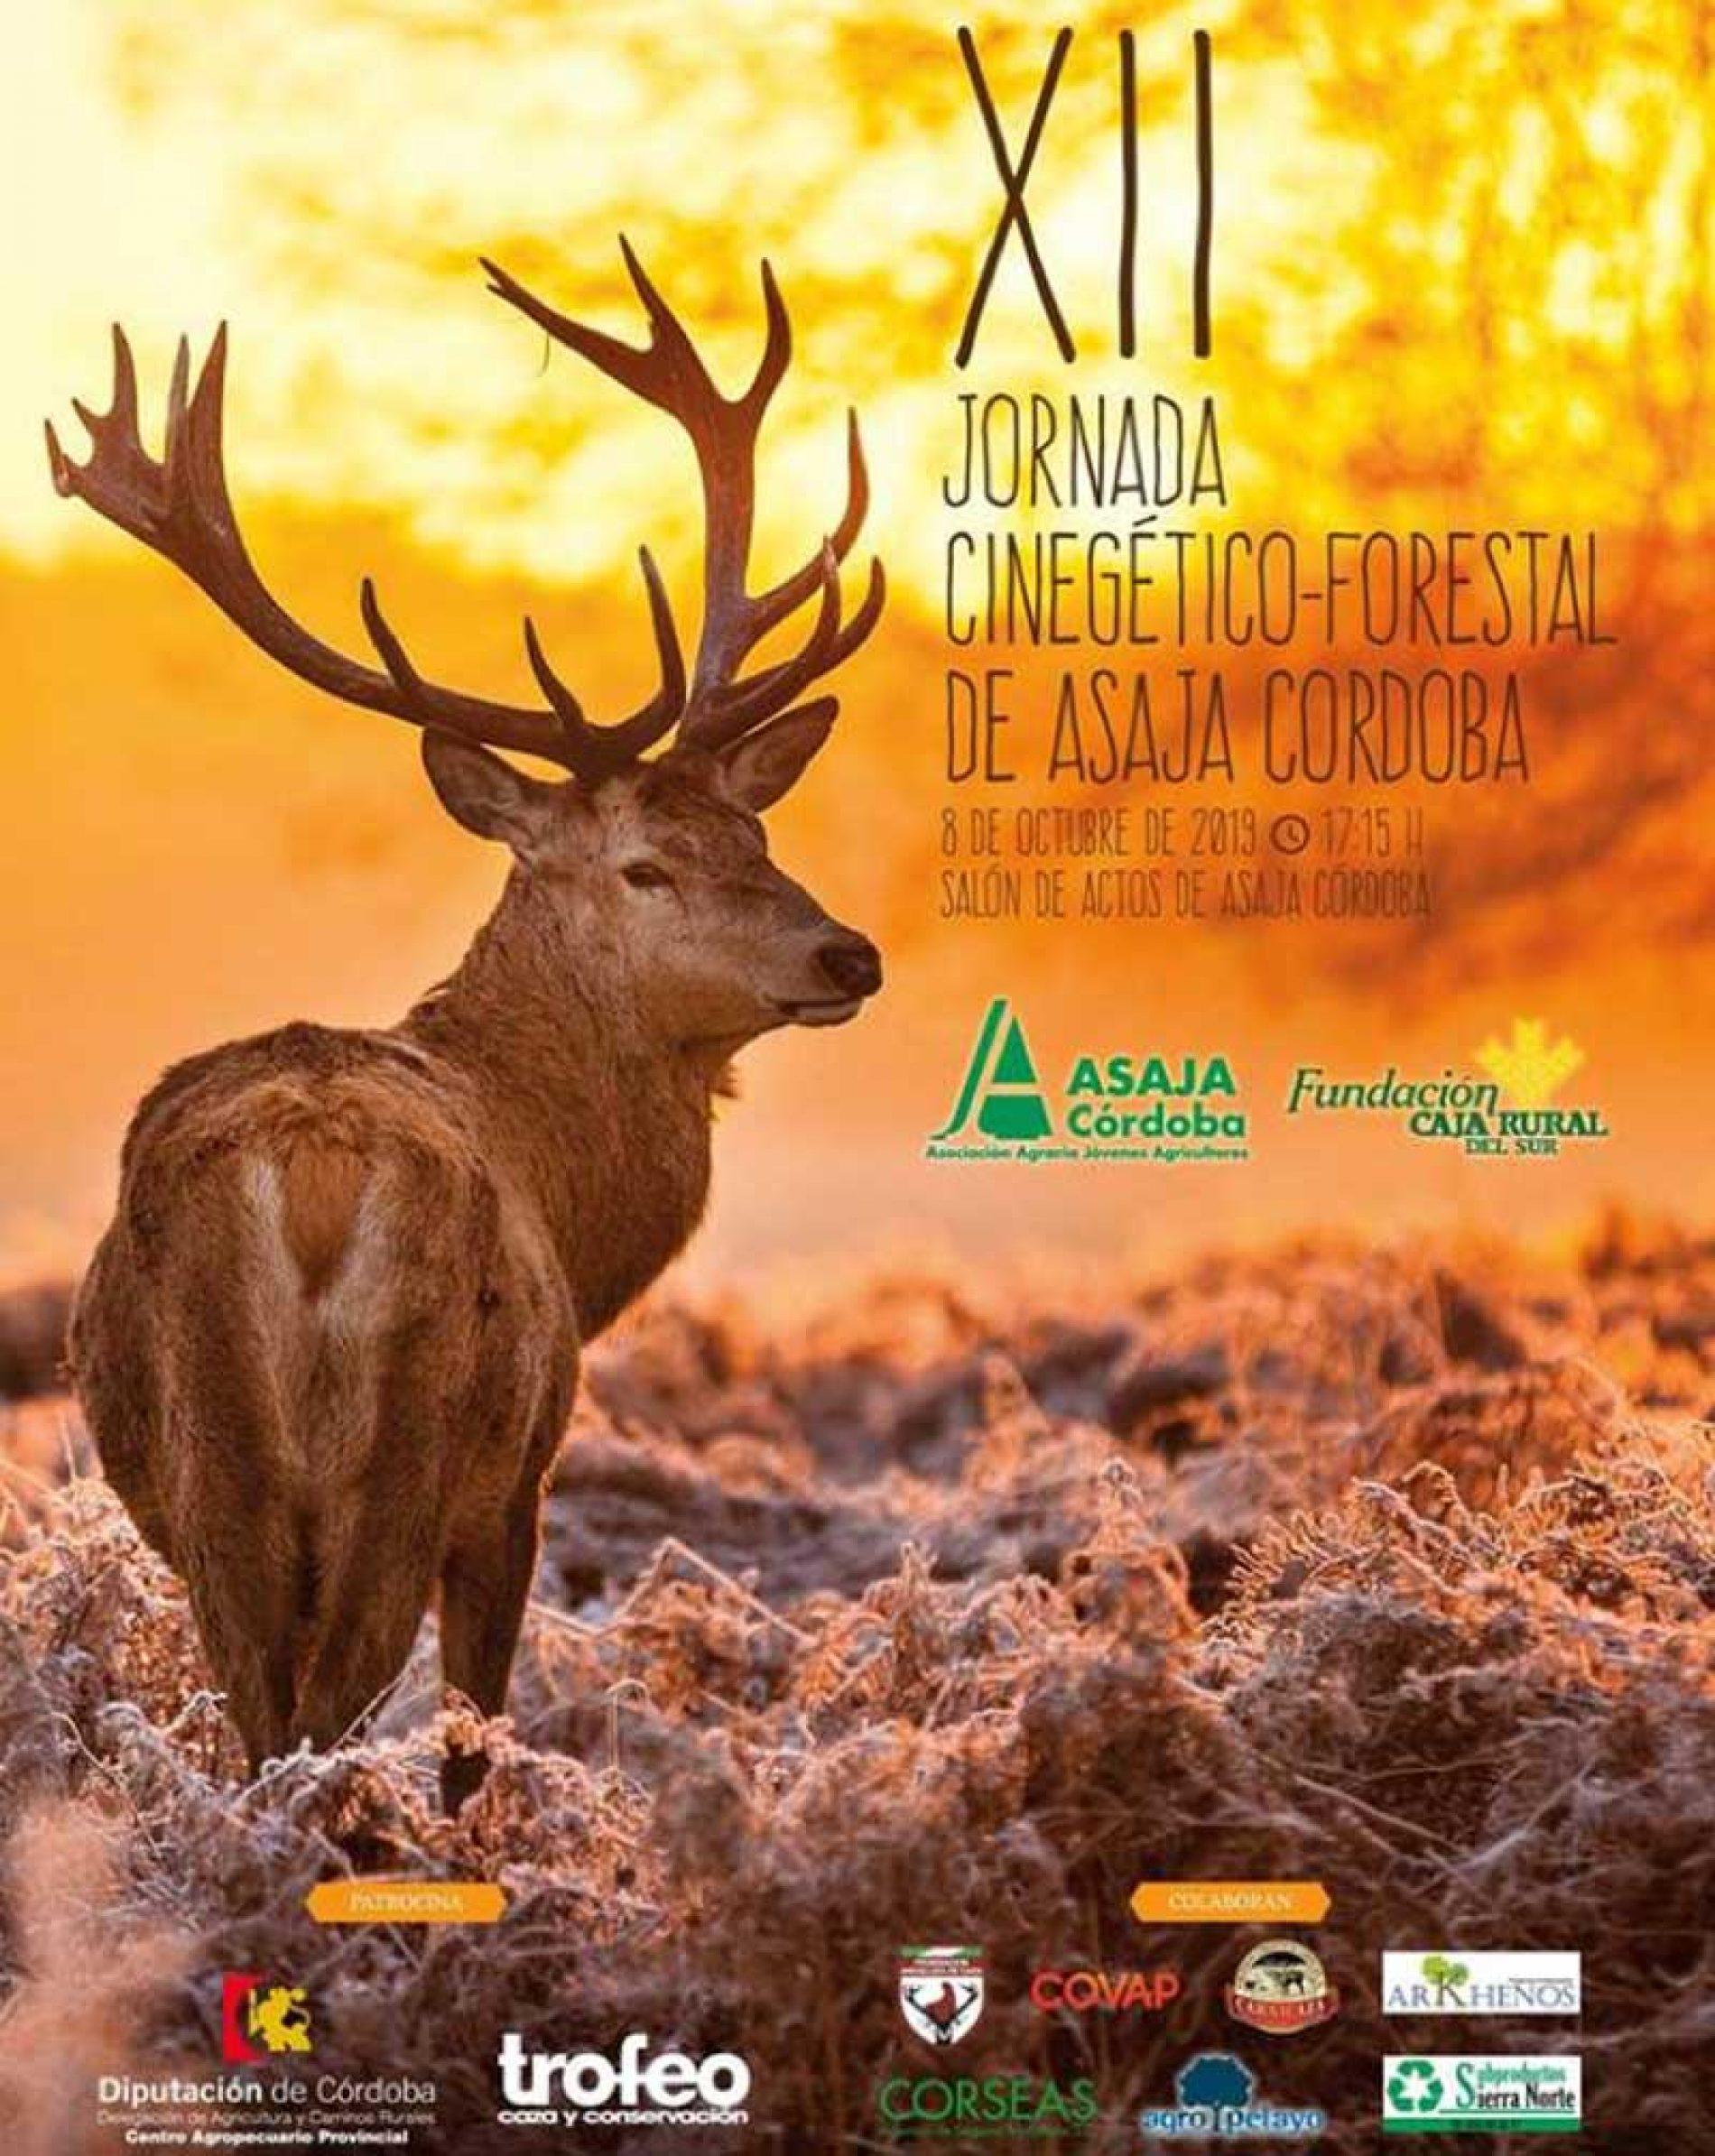 El 8 de octubre se celebran la XII Jornada Cinegético-Forestal de Asaja Córdoba